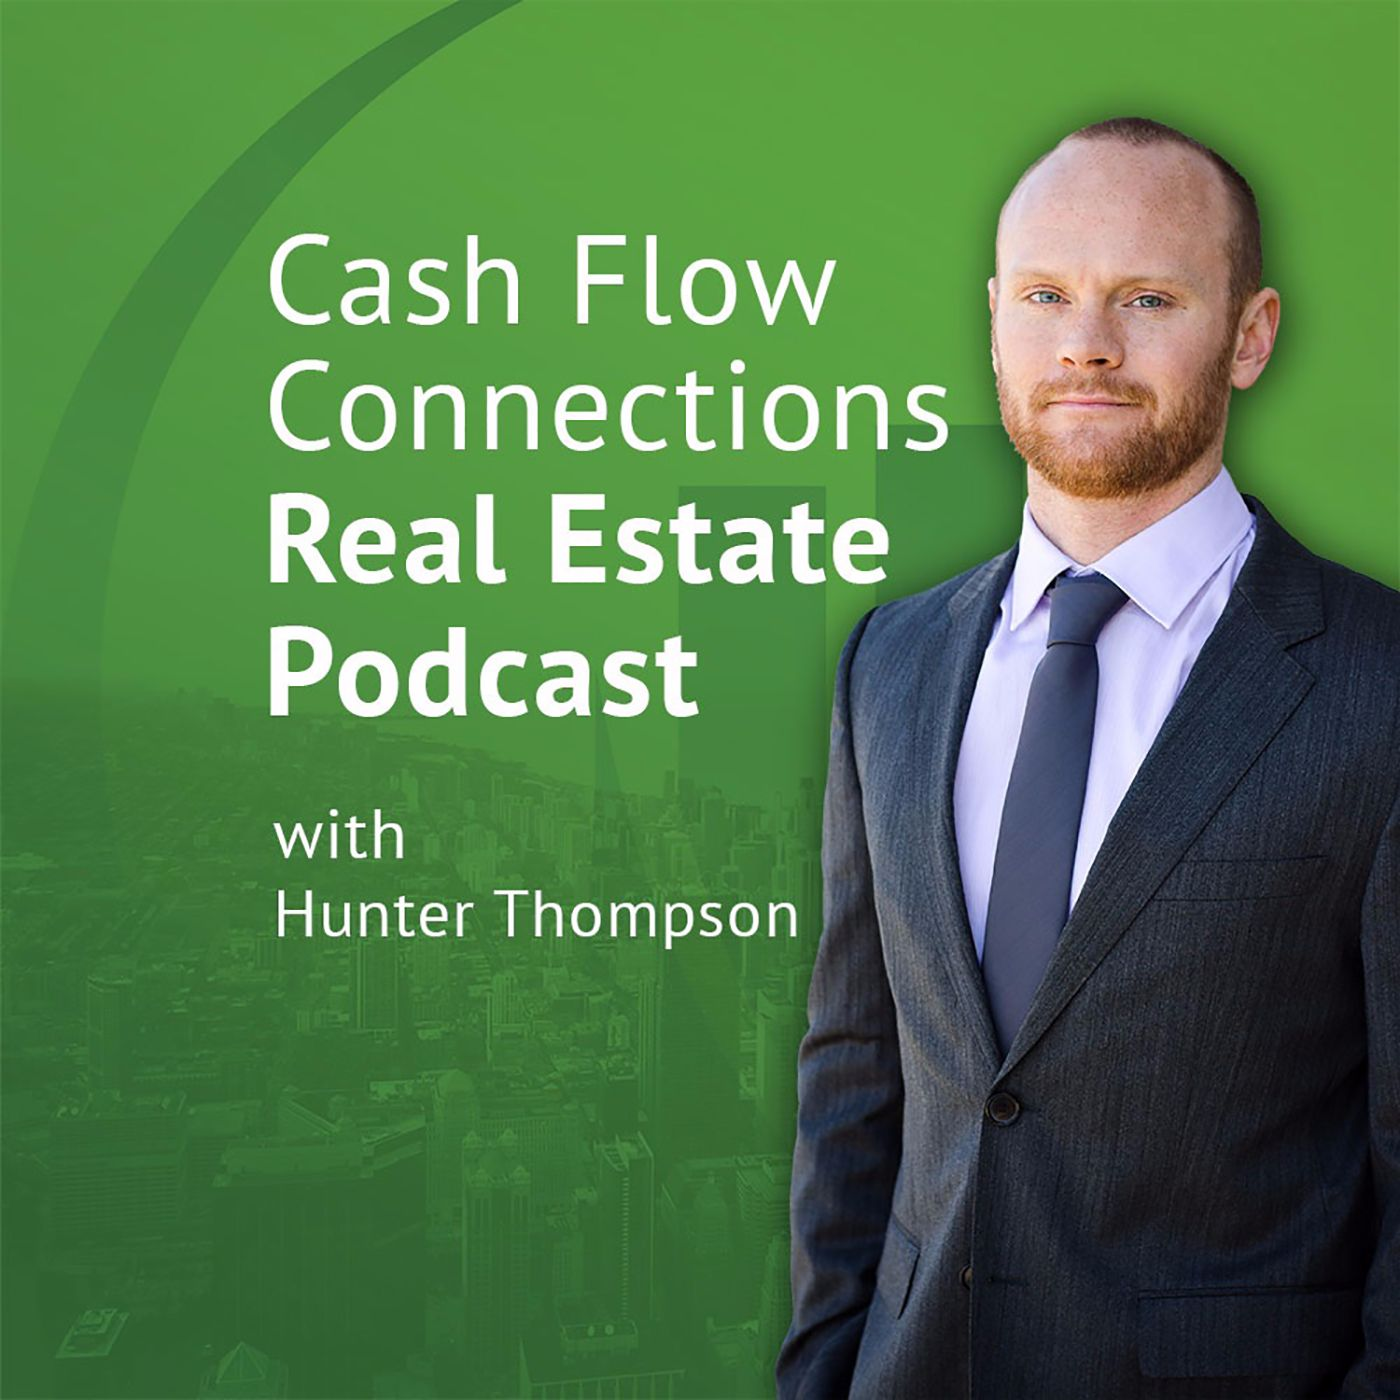 E155 - Learn to Flip the Script On Your Investors With Oren Klaff show art